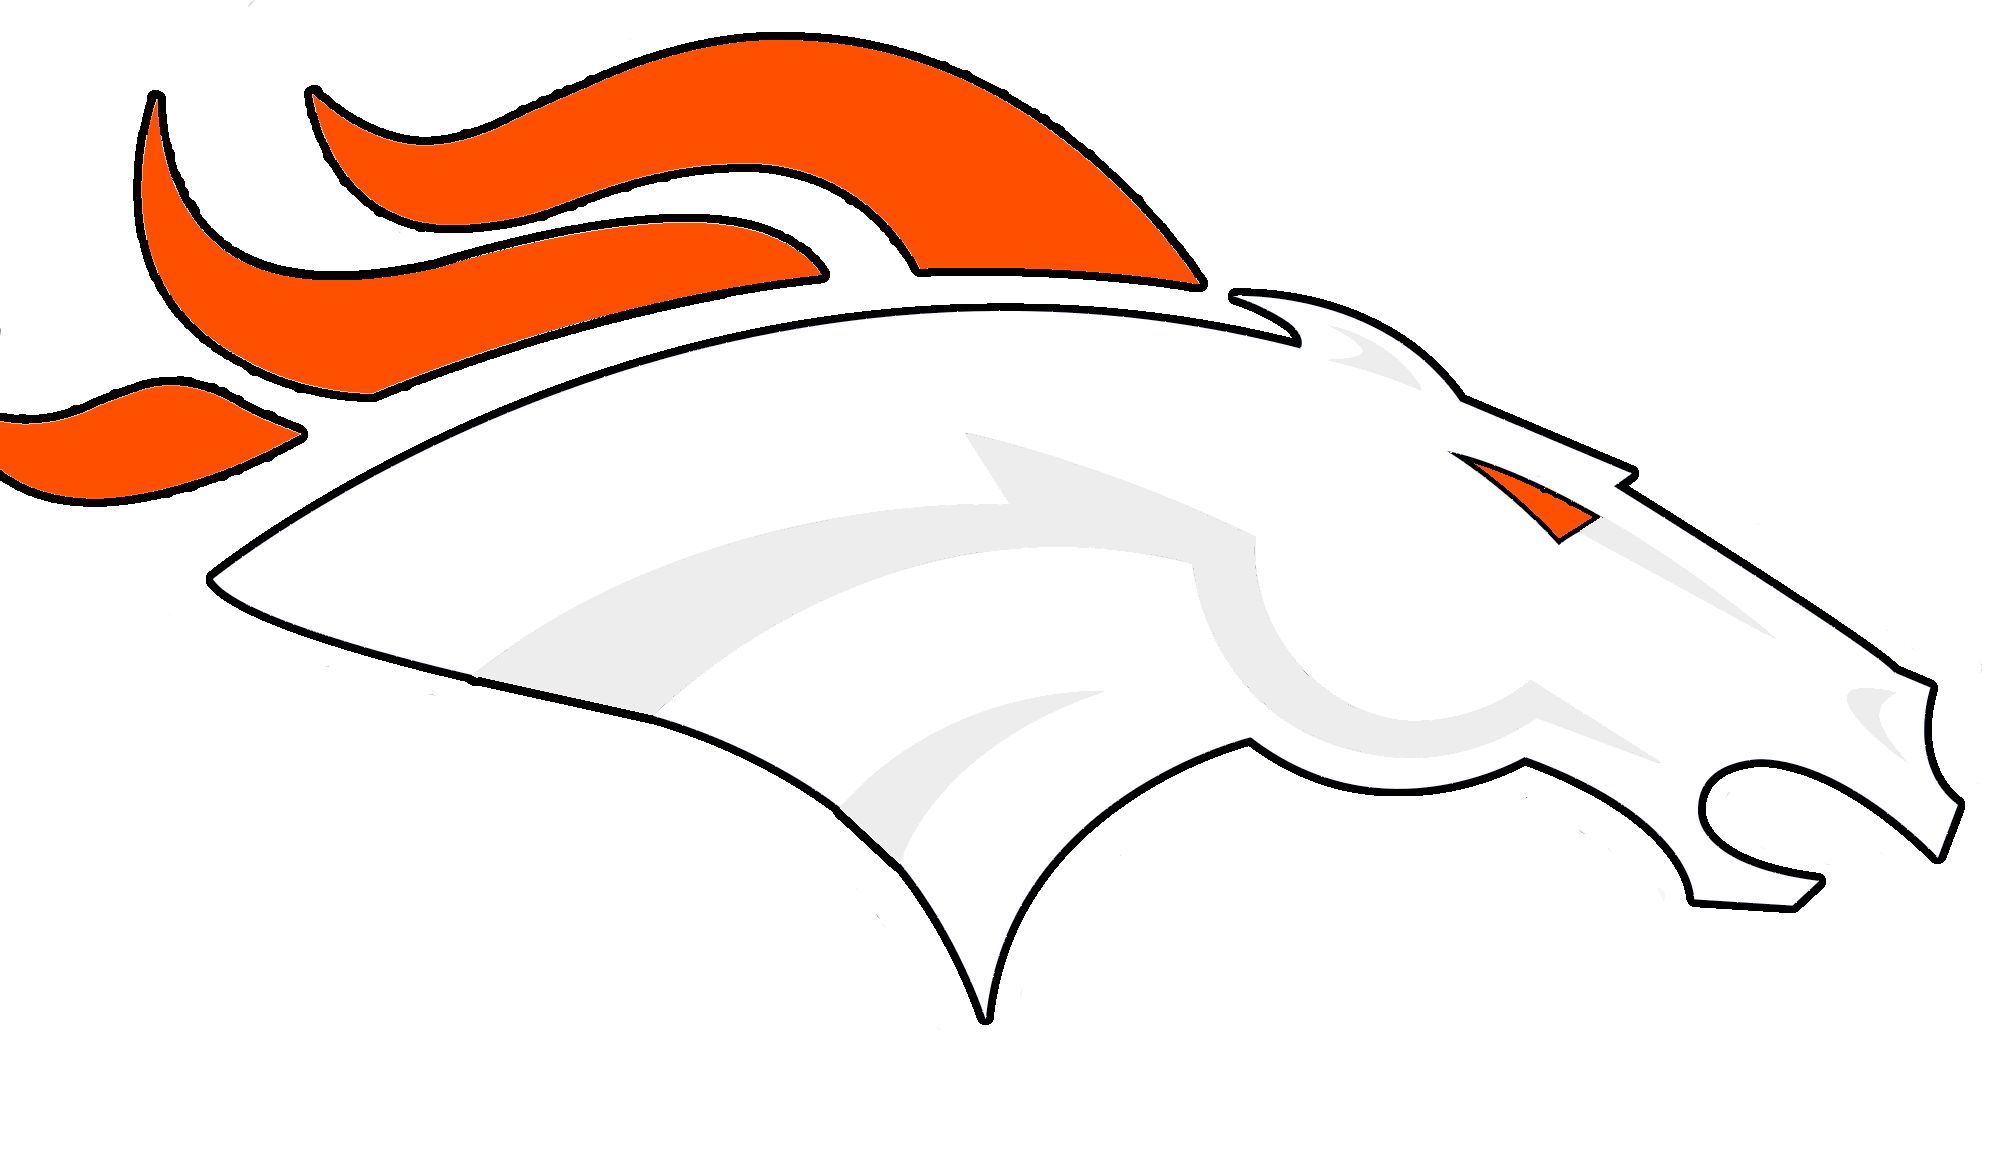 Denver Broncos Logo Clip Art - ClipArt Best - ClipArt Best